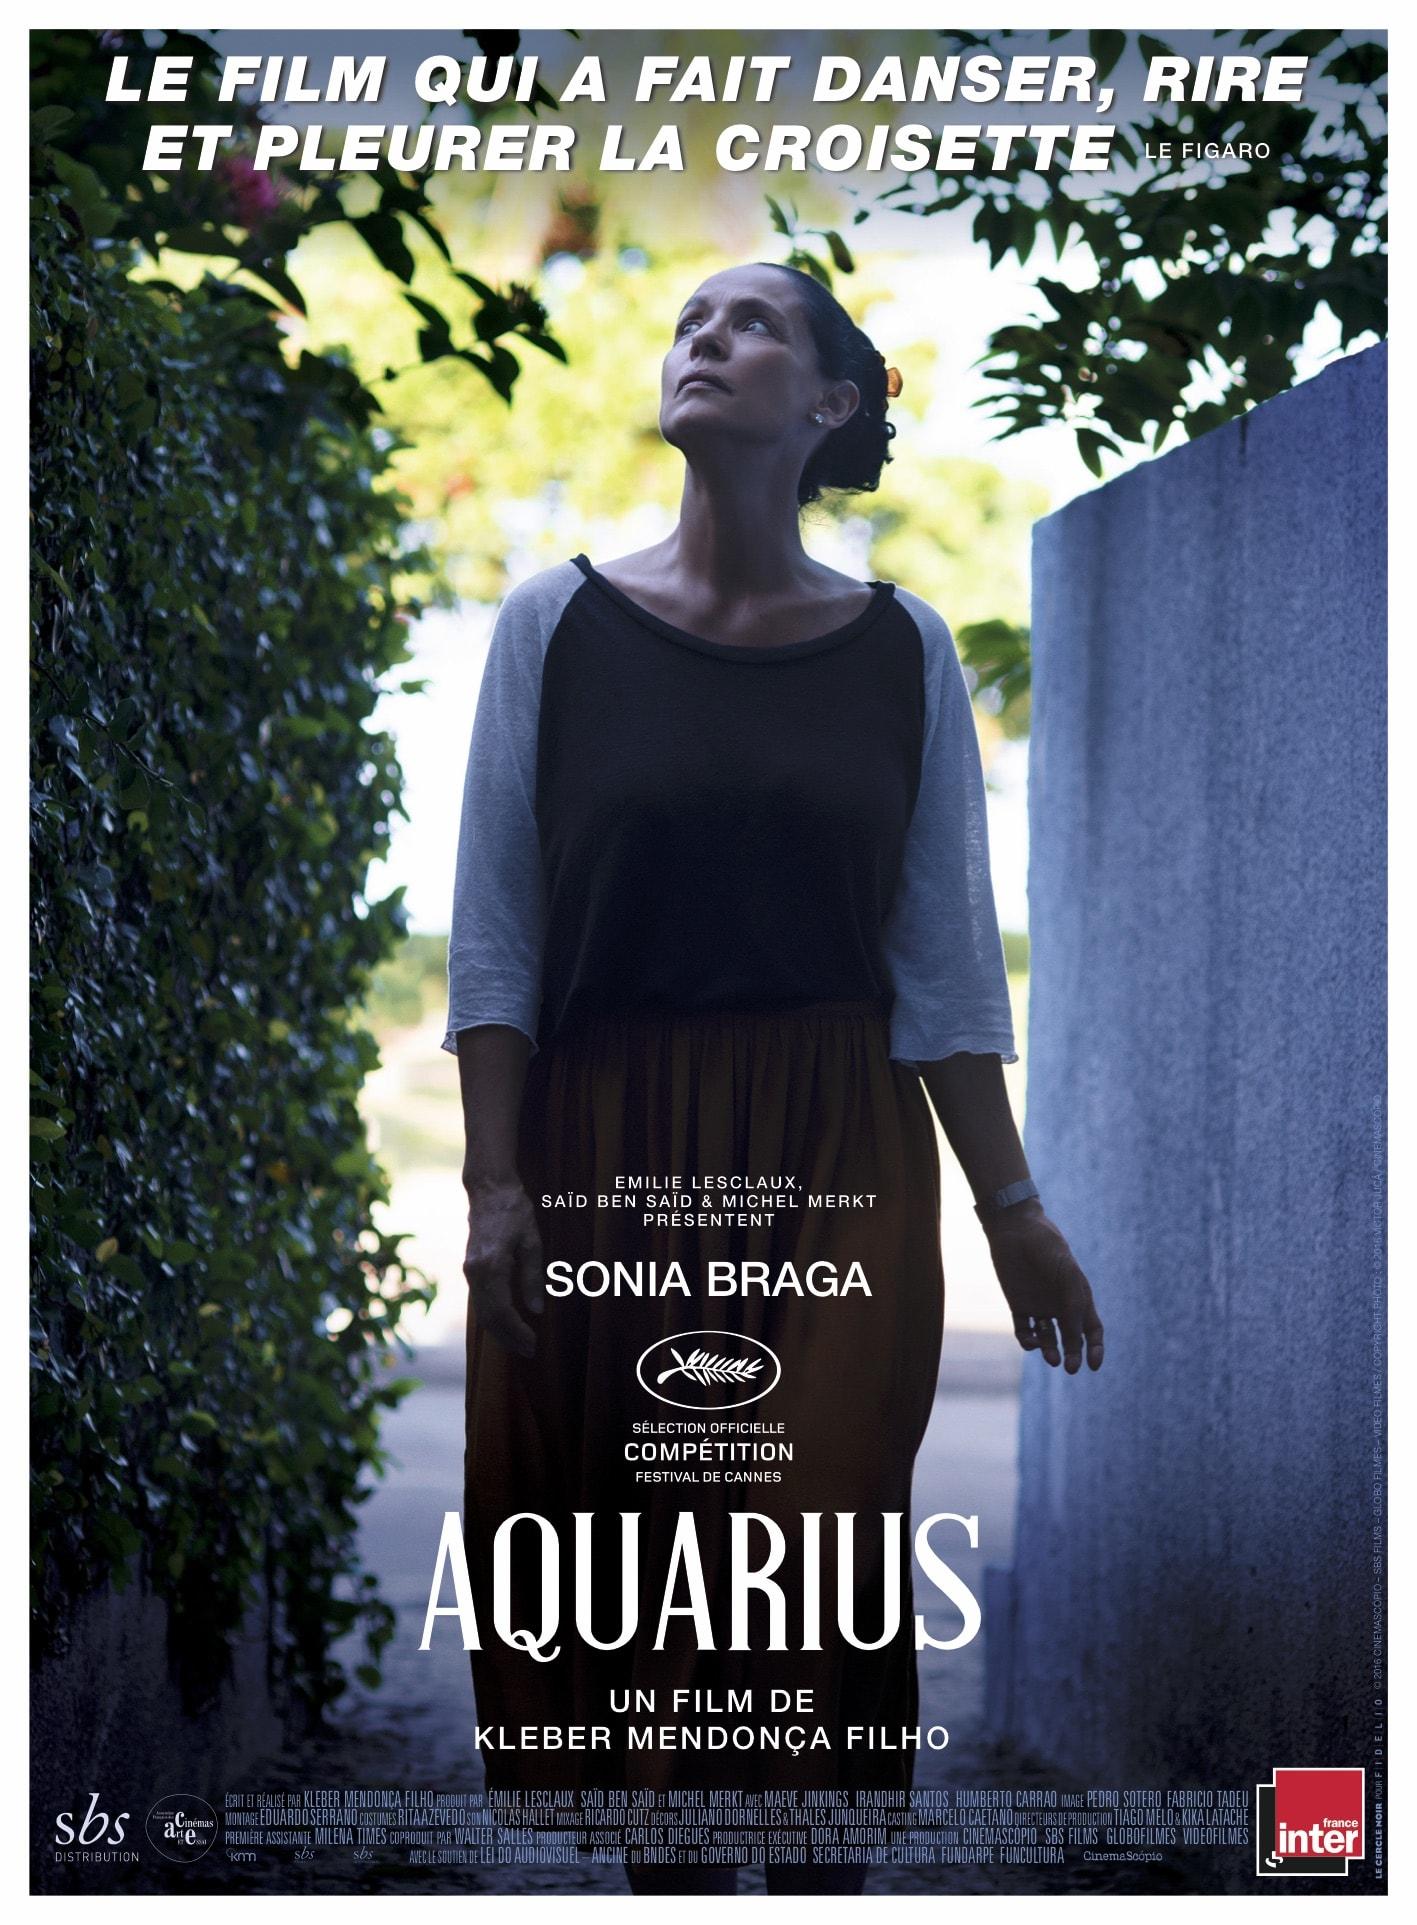 AQUARIUS de Kleber Mendonça Filho affiche film cinéma